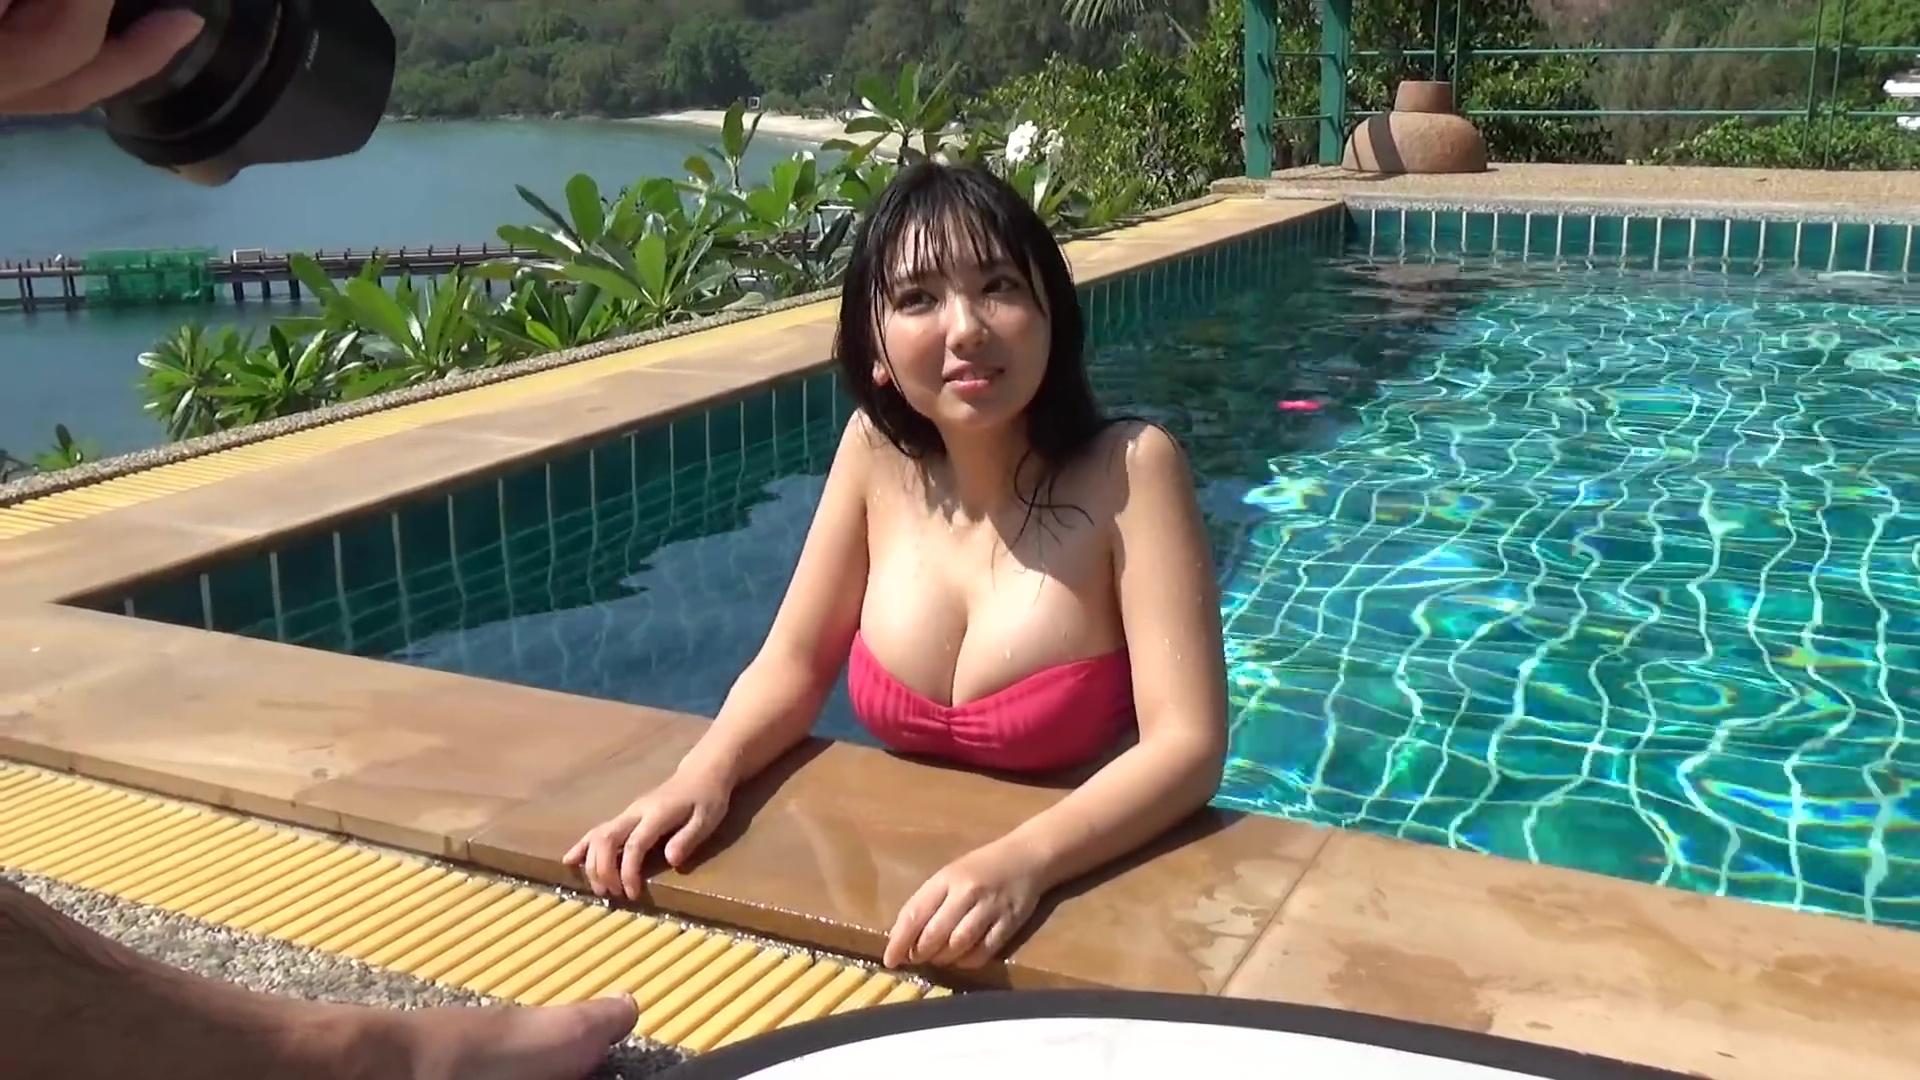 Bikini, Oppai (おっぱい), Sawaguchi Aika (沢口愛華), Screenshot